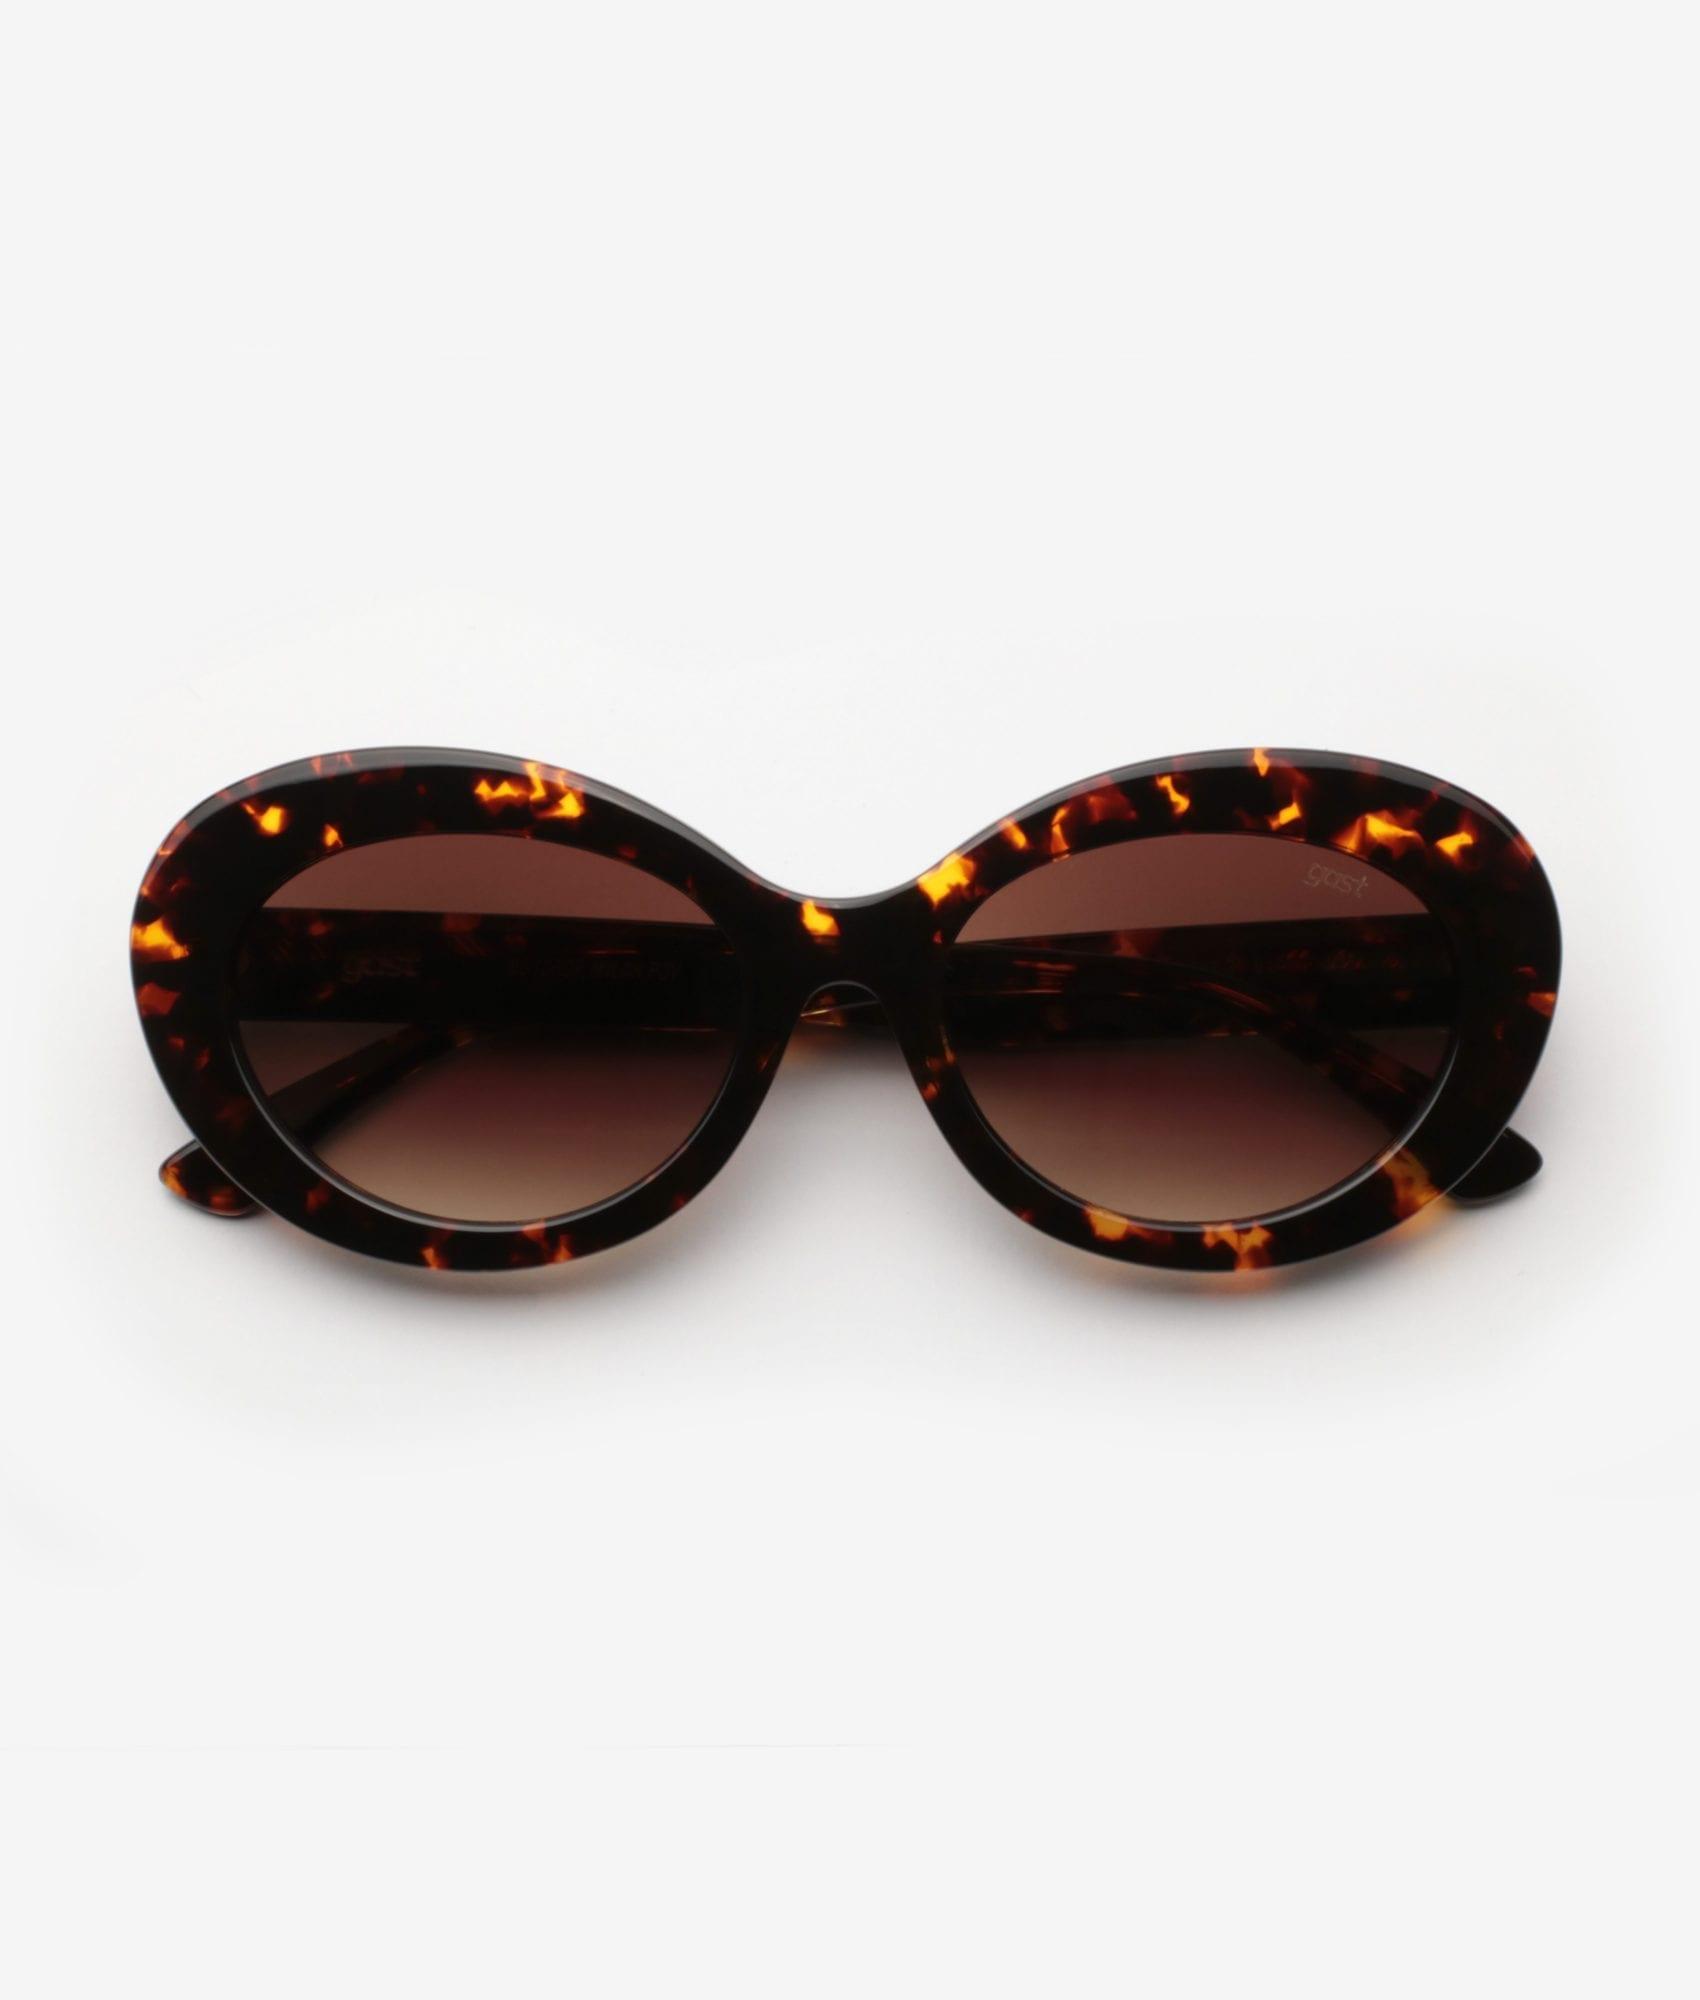 VENTI 154 Havana Gast Sunglasses